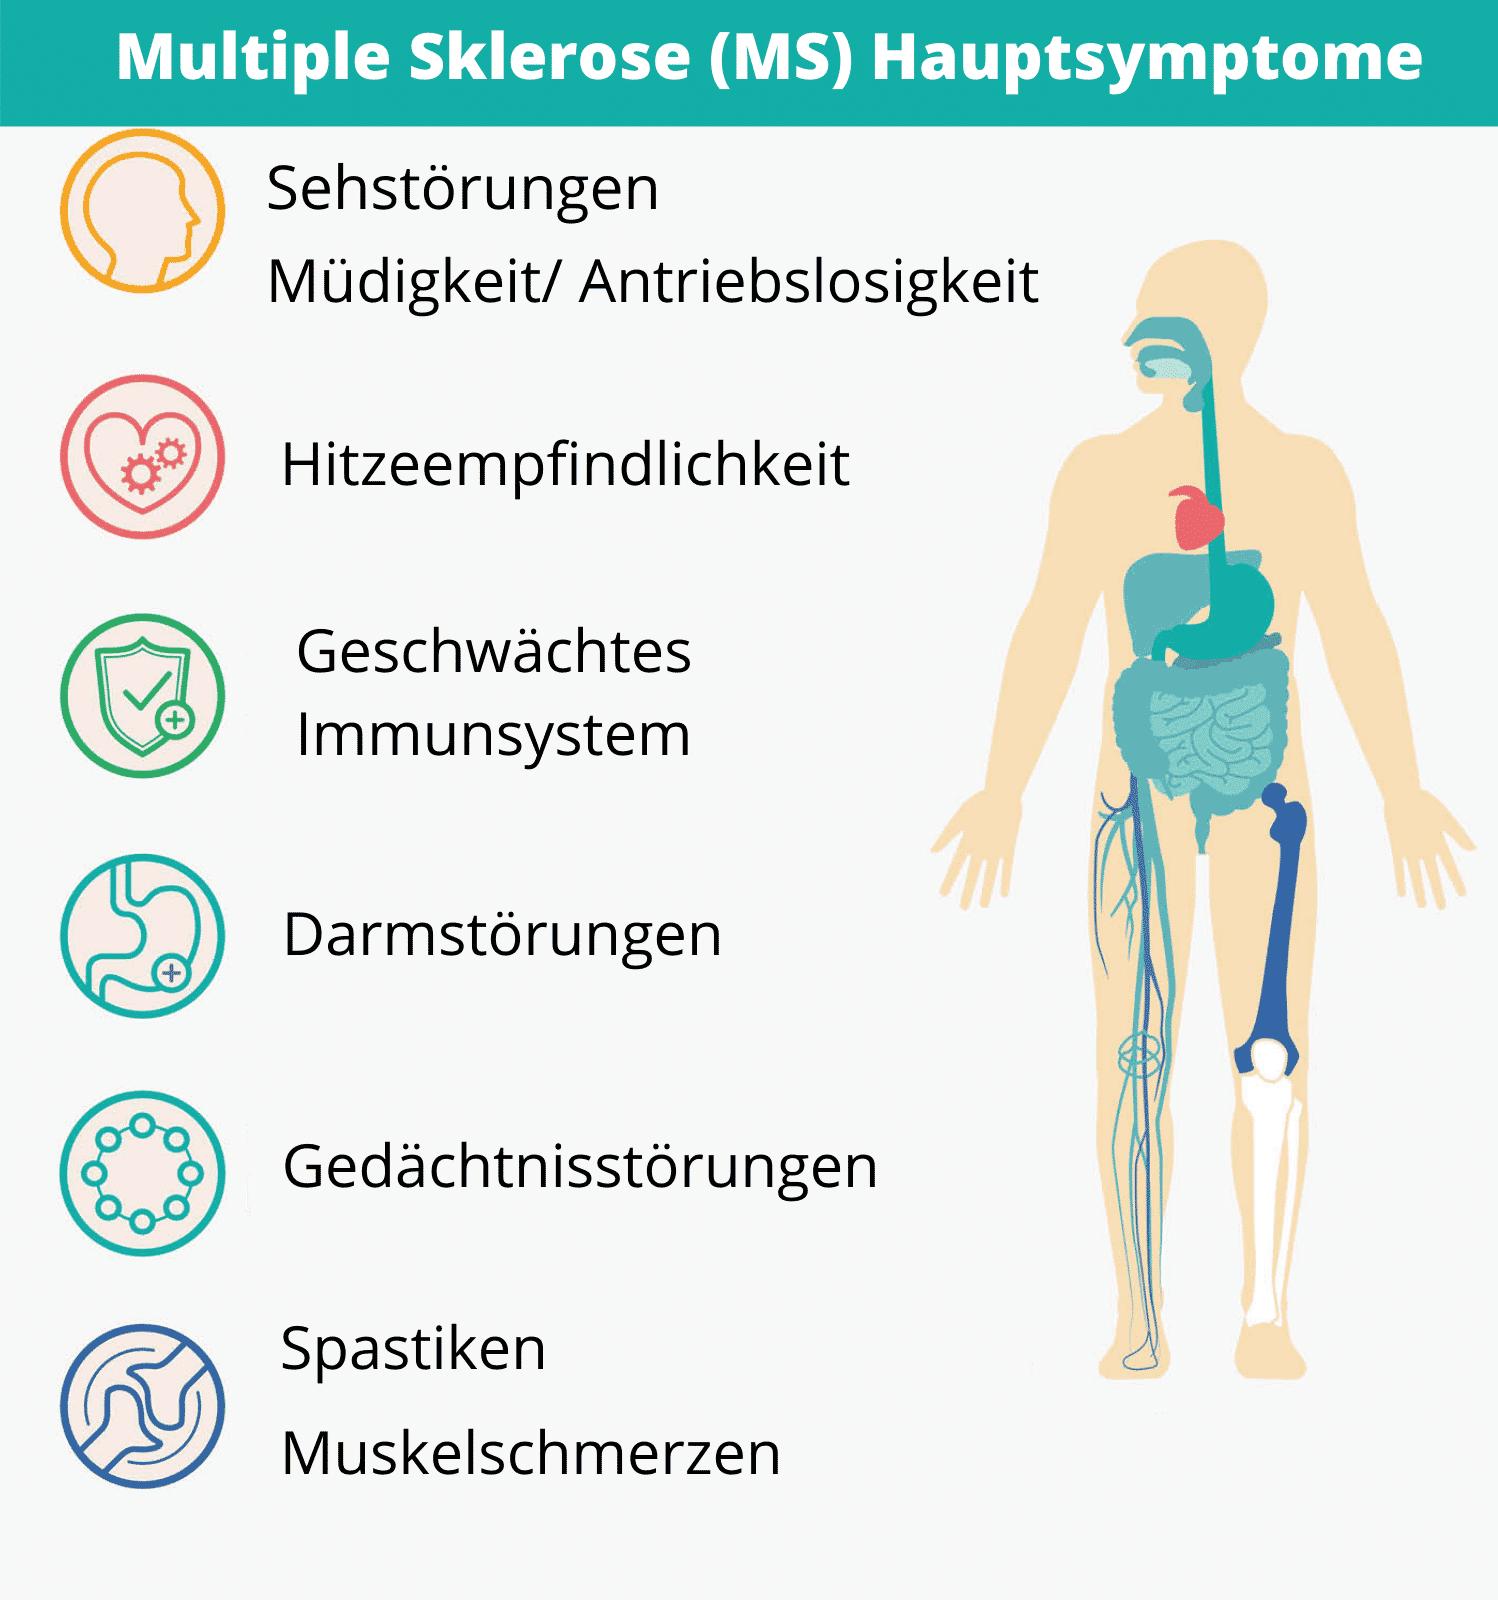 Multiple-Sklerose-MS-Hauptsyptome